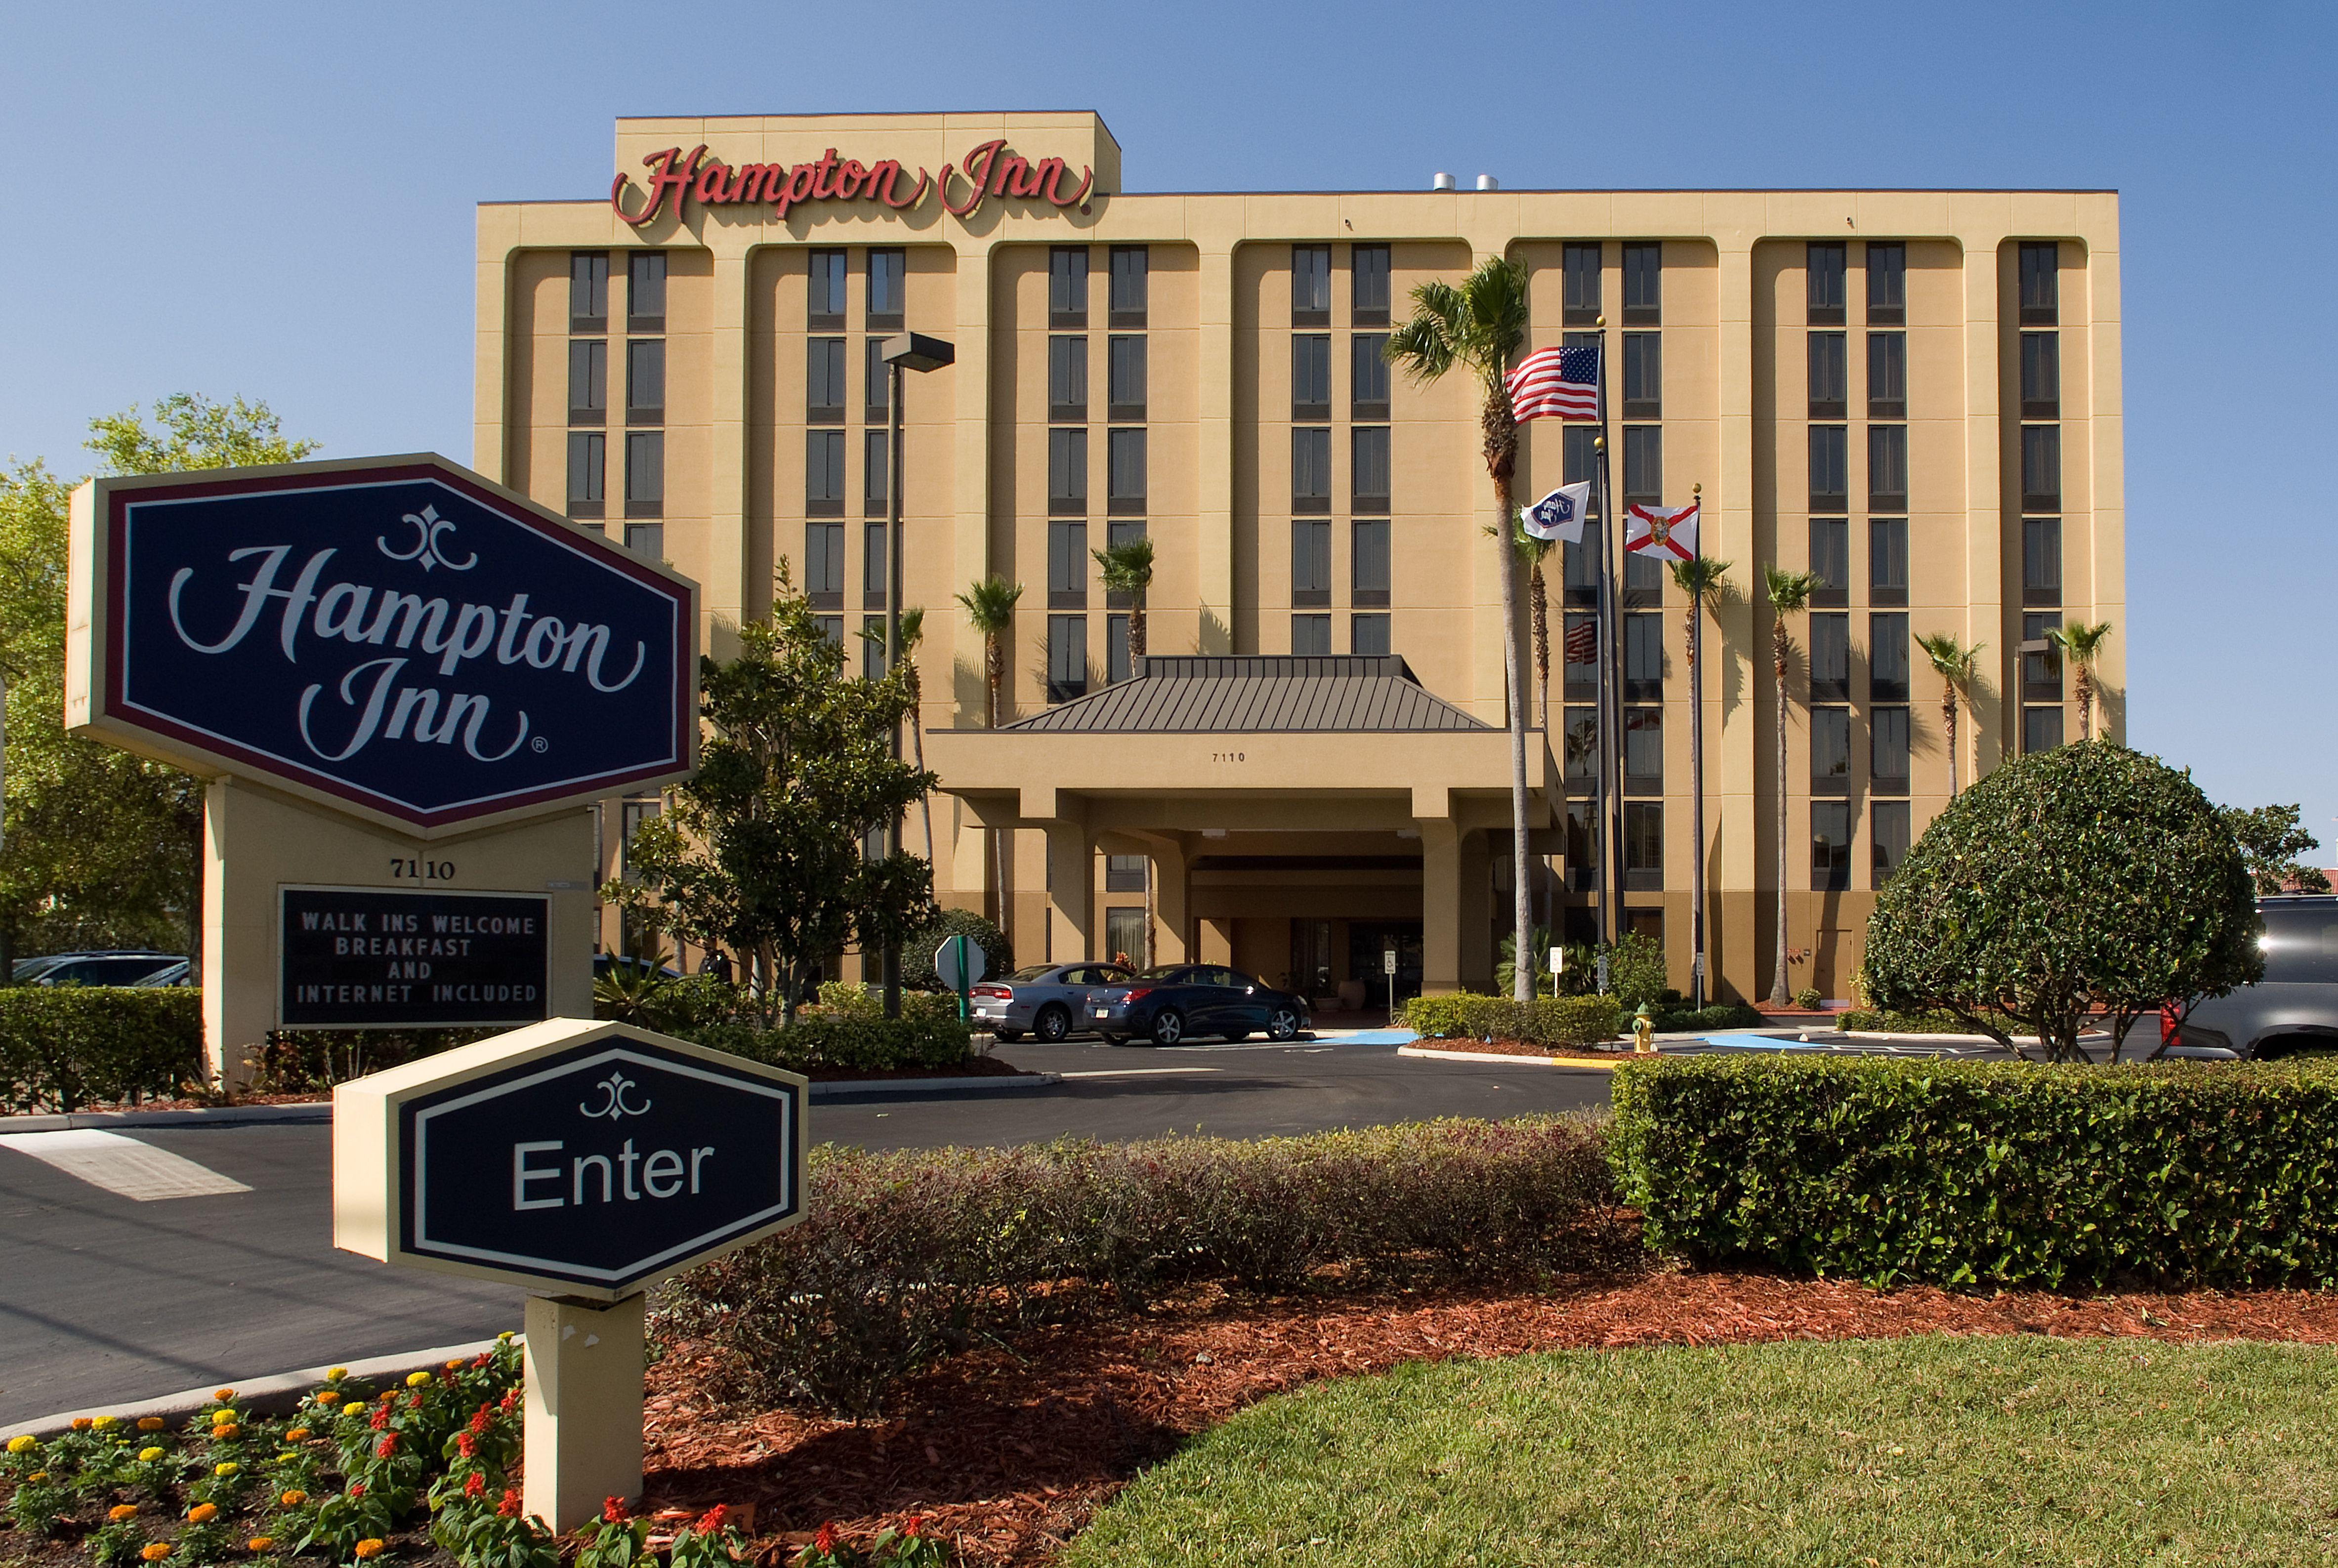 Welcome to the Hampton Inn Orlando-S. Of Universal Studios hotel in ...